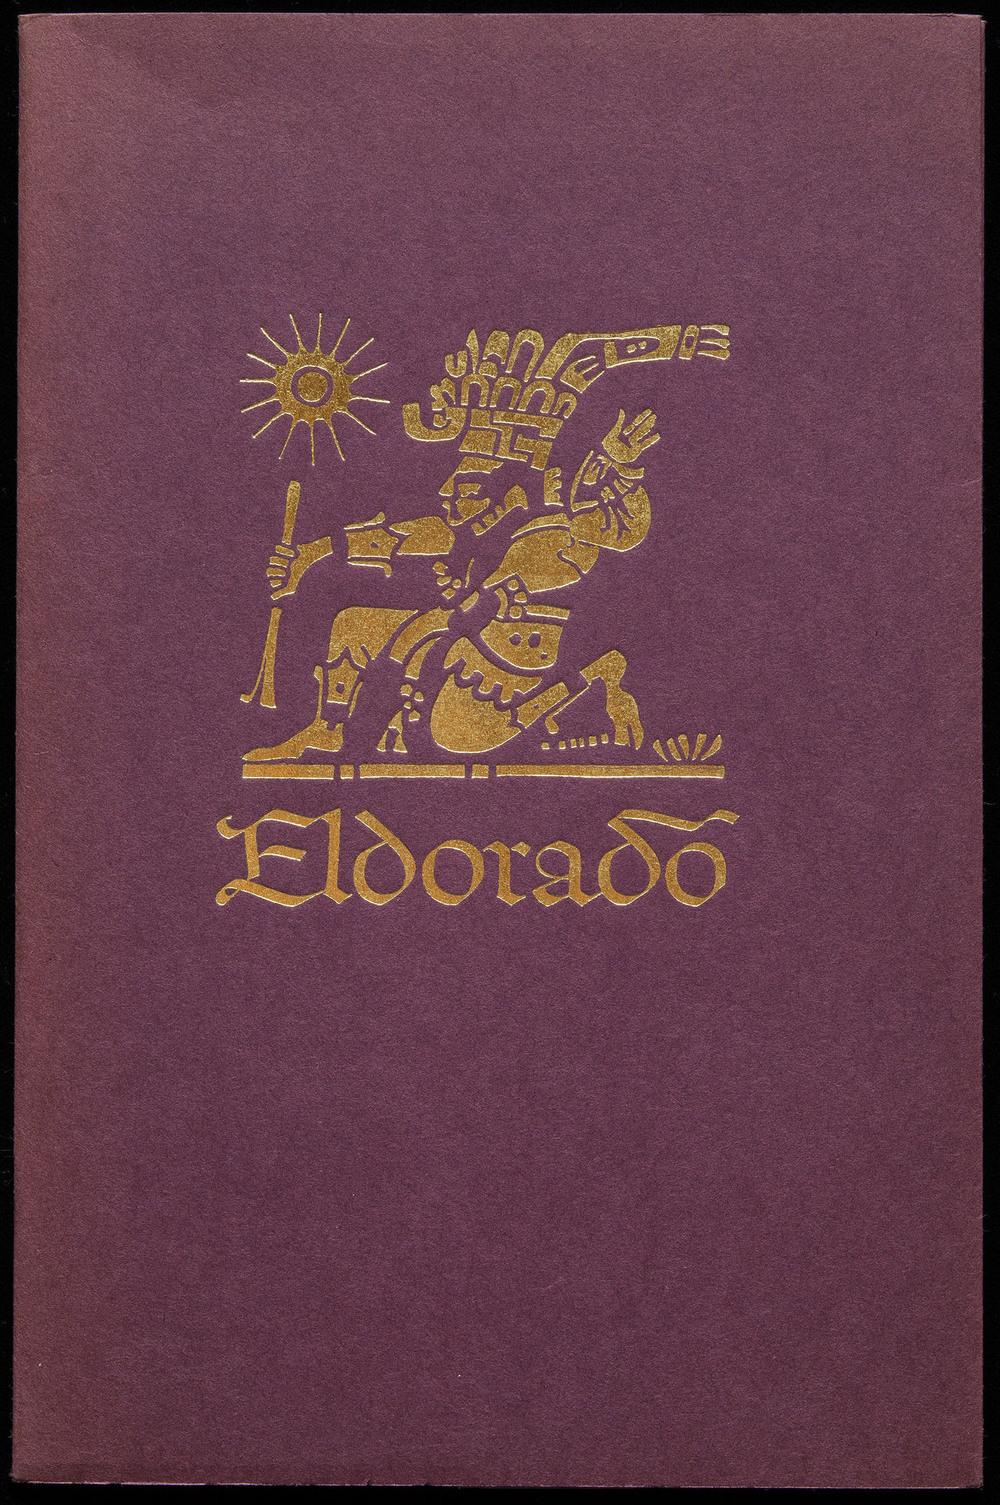 Eldorado type specimen booklet, Mergenthaler Linotype, Brooklyn, 1953, 14 x 21 cm